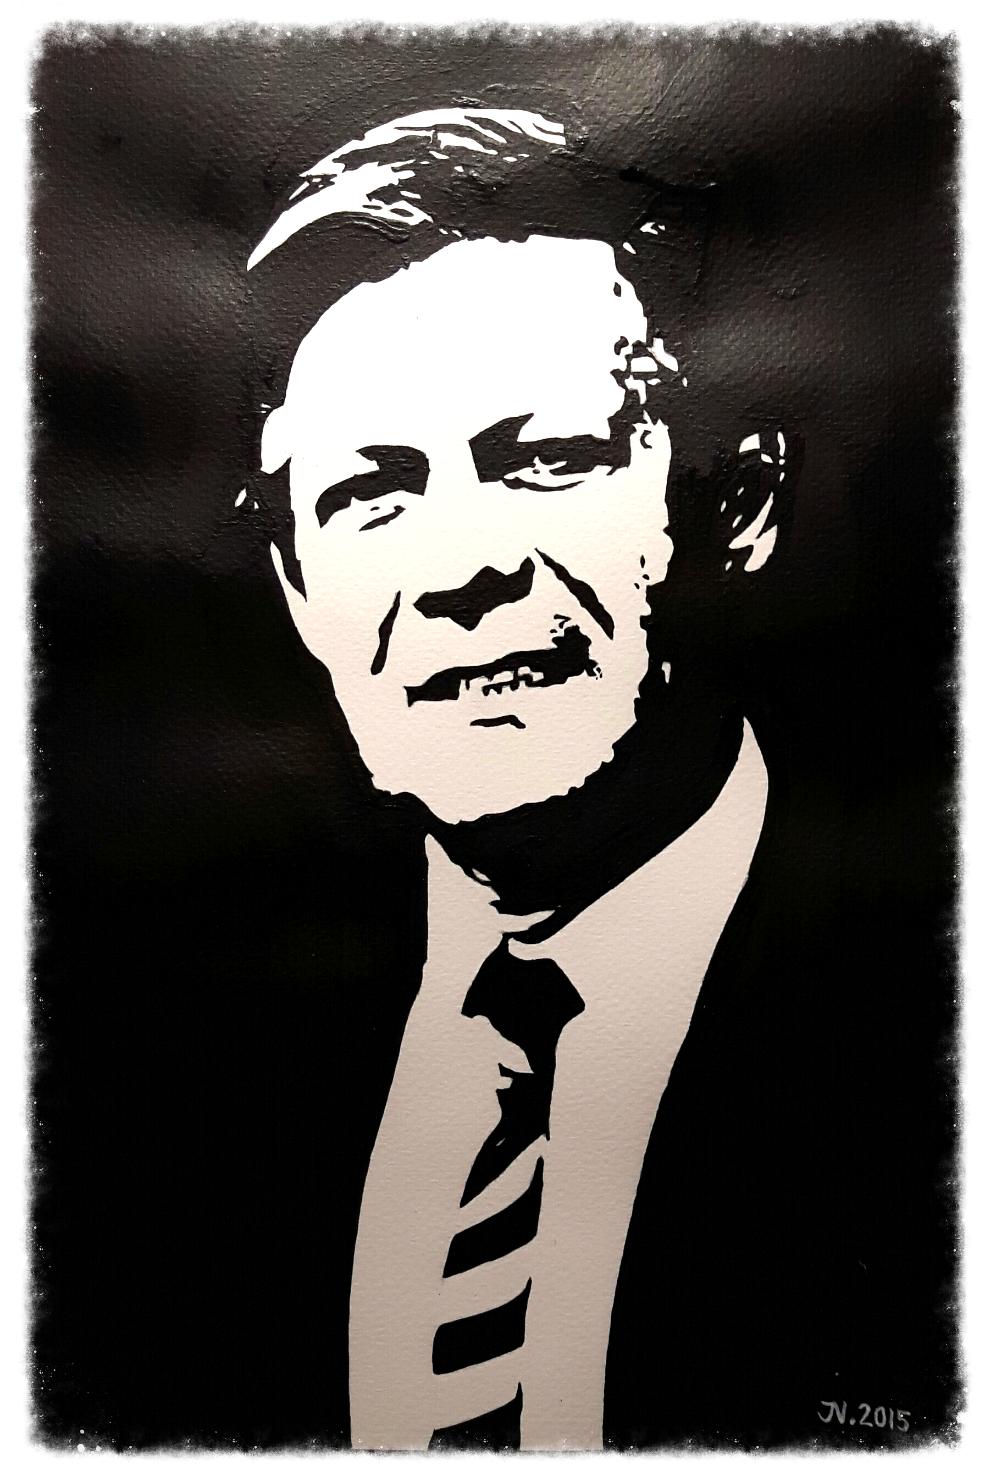 Helmut Schmidt 1